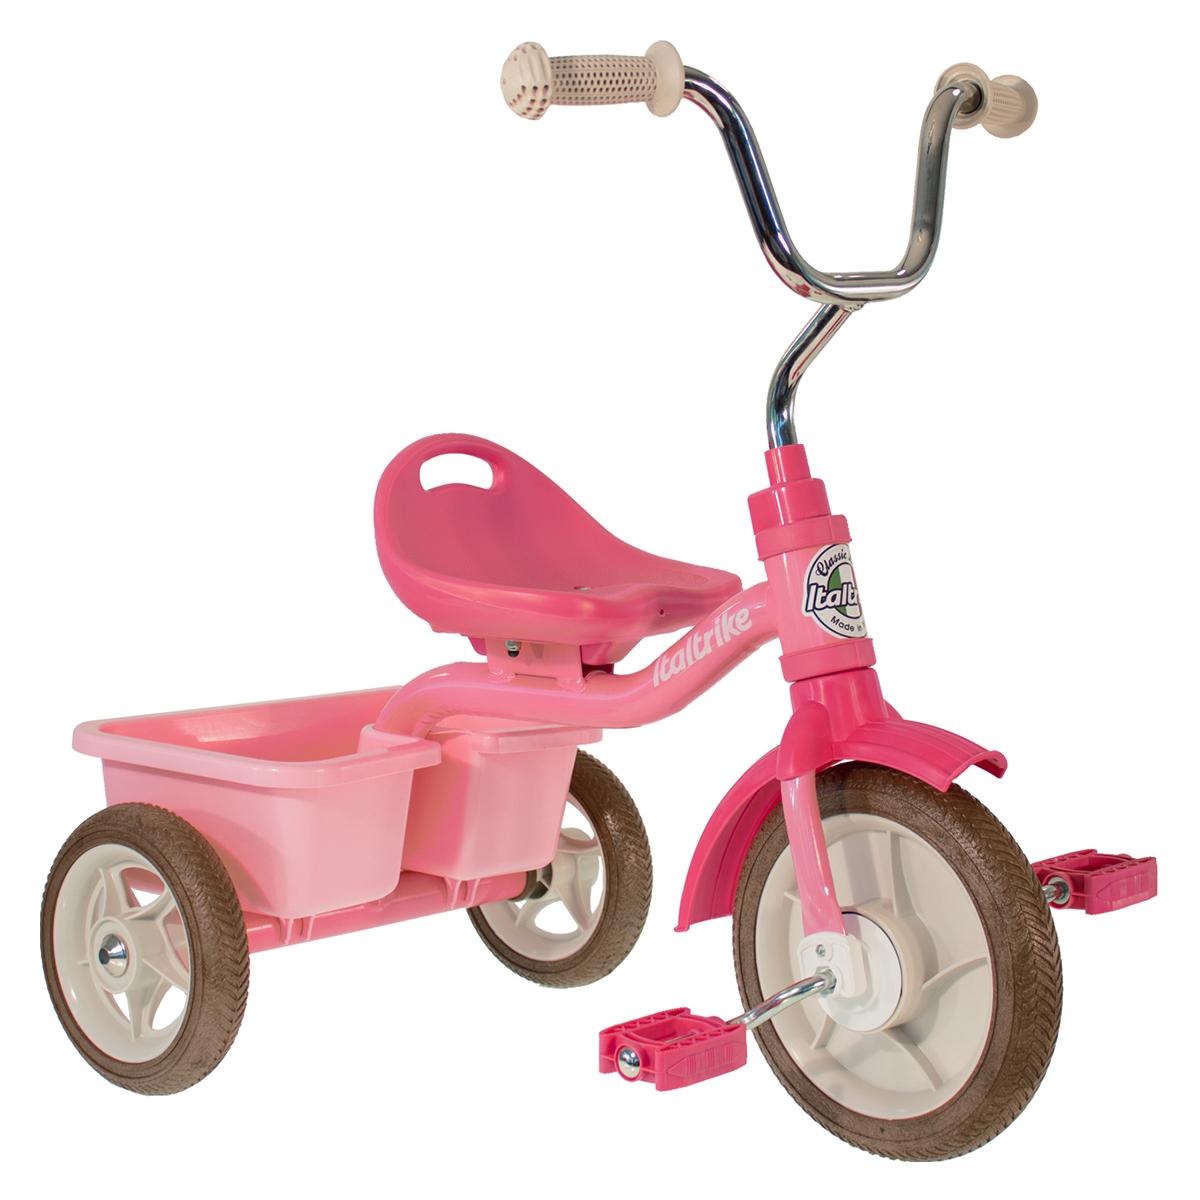 Trotteur & Porteur Tricycle Transporter Rose Garden - Rose Tricycle Transporter Rose Garden - Rose